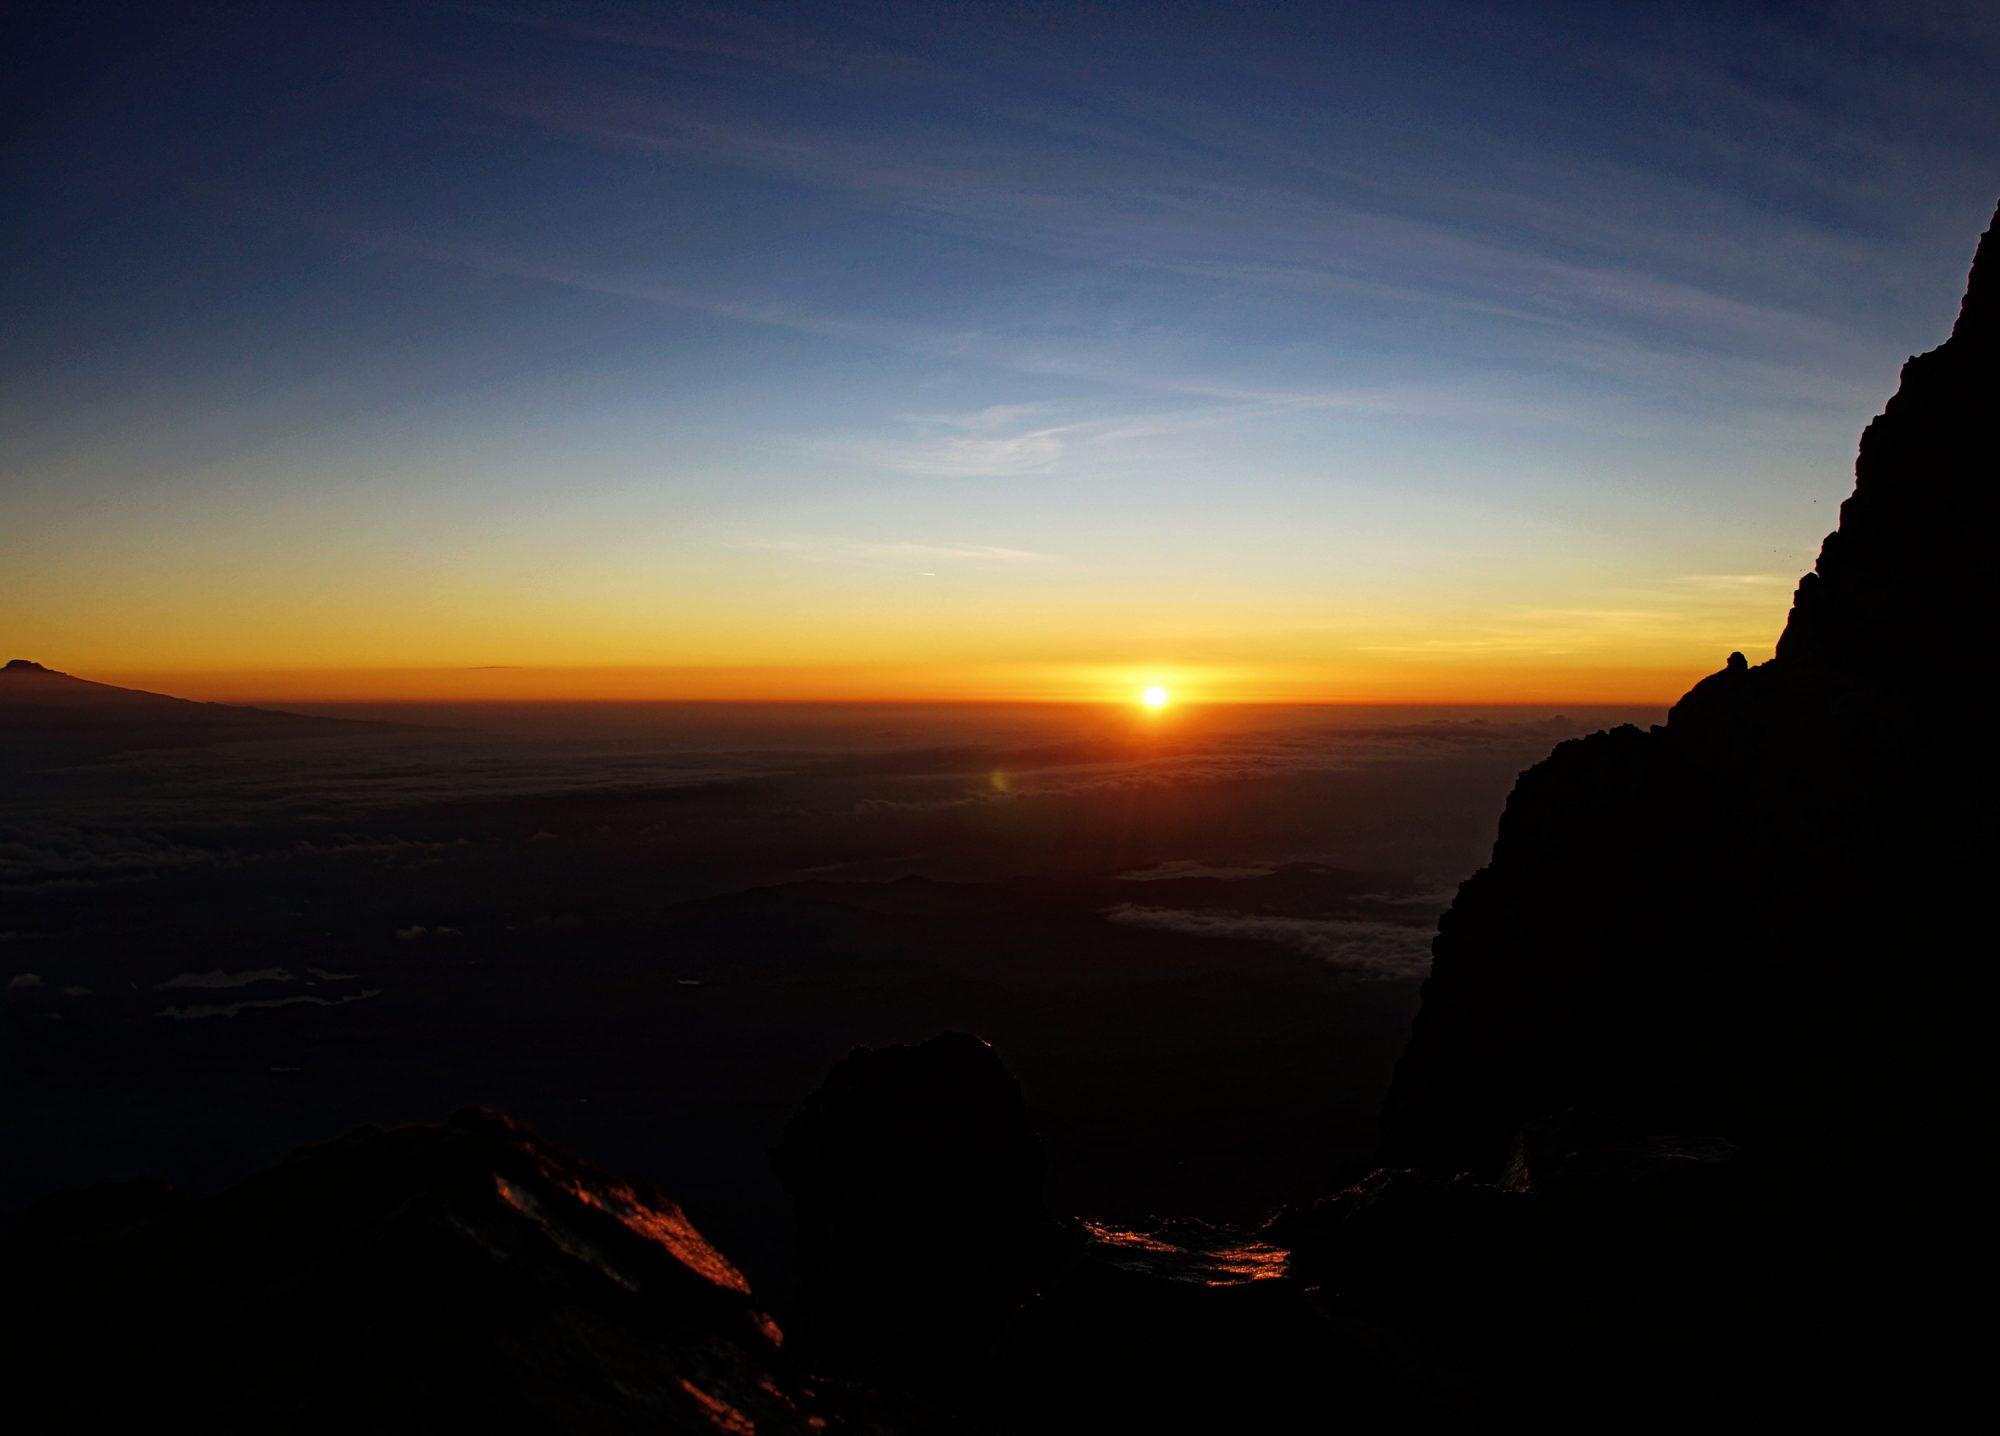 Sonnenaufgang am Mount Meru, Regenwald, Arusha Nationalpark, Tansania, Afrika